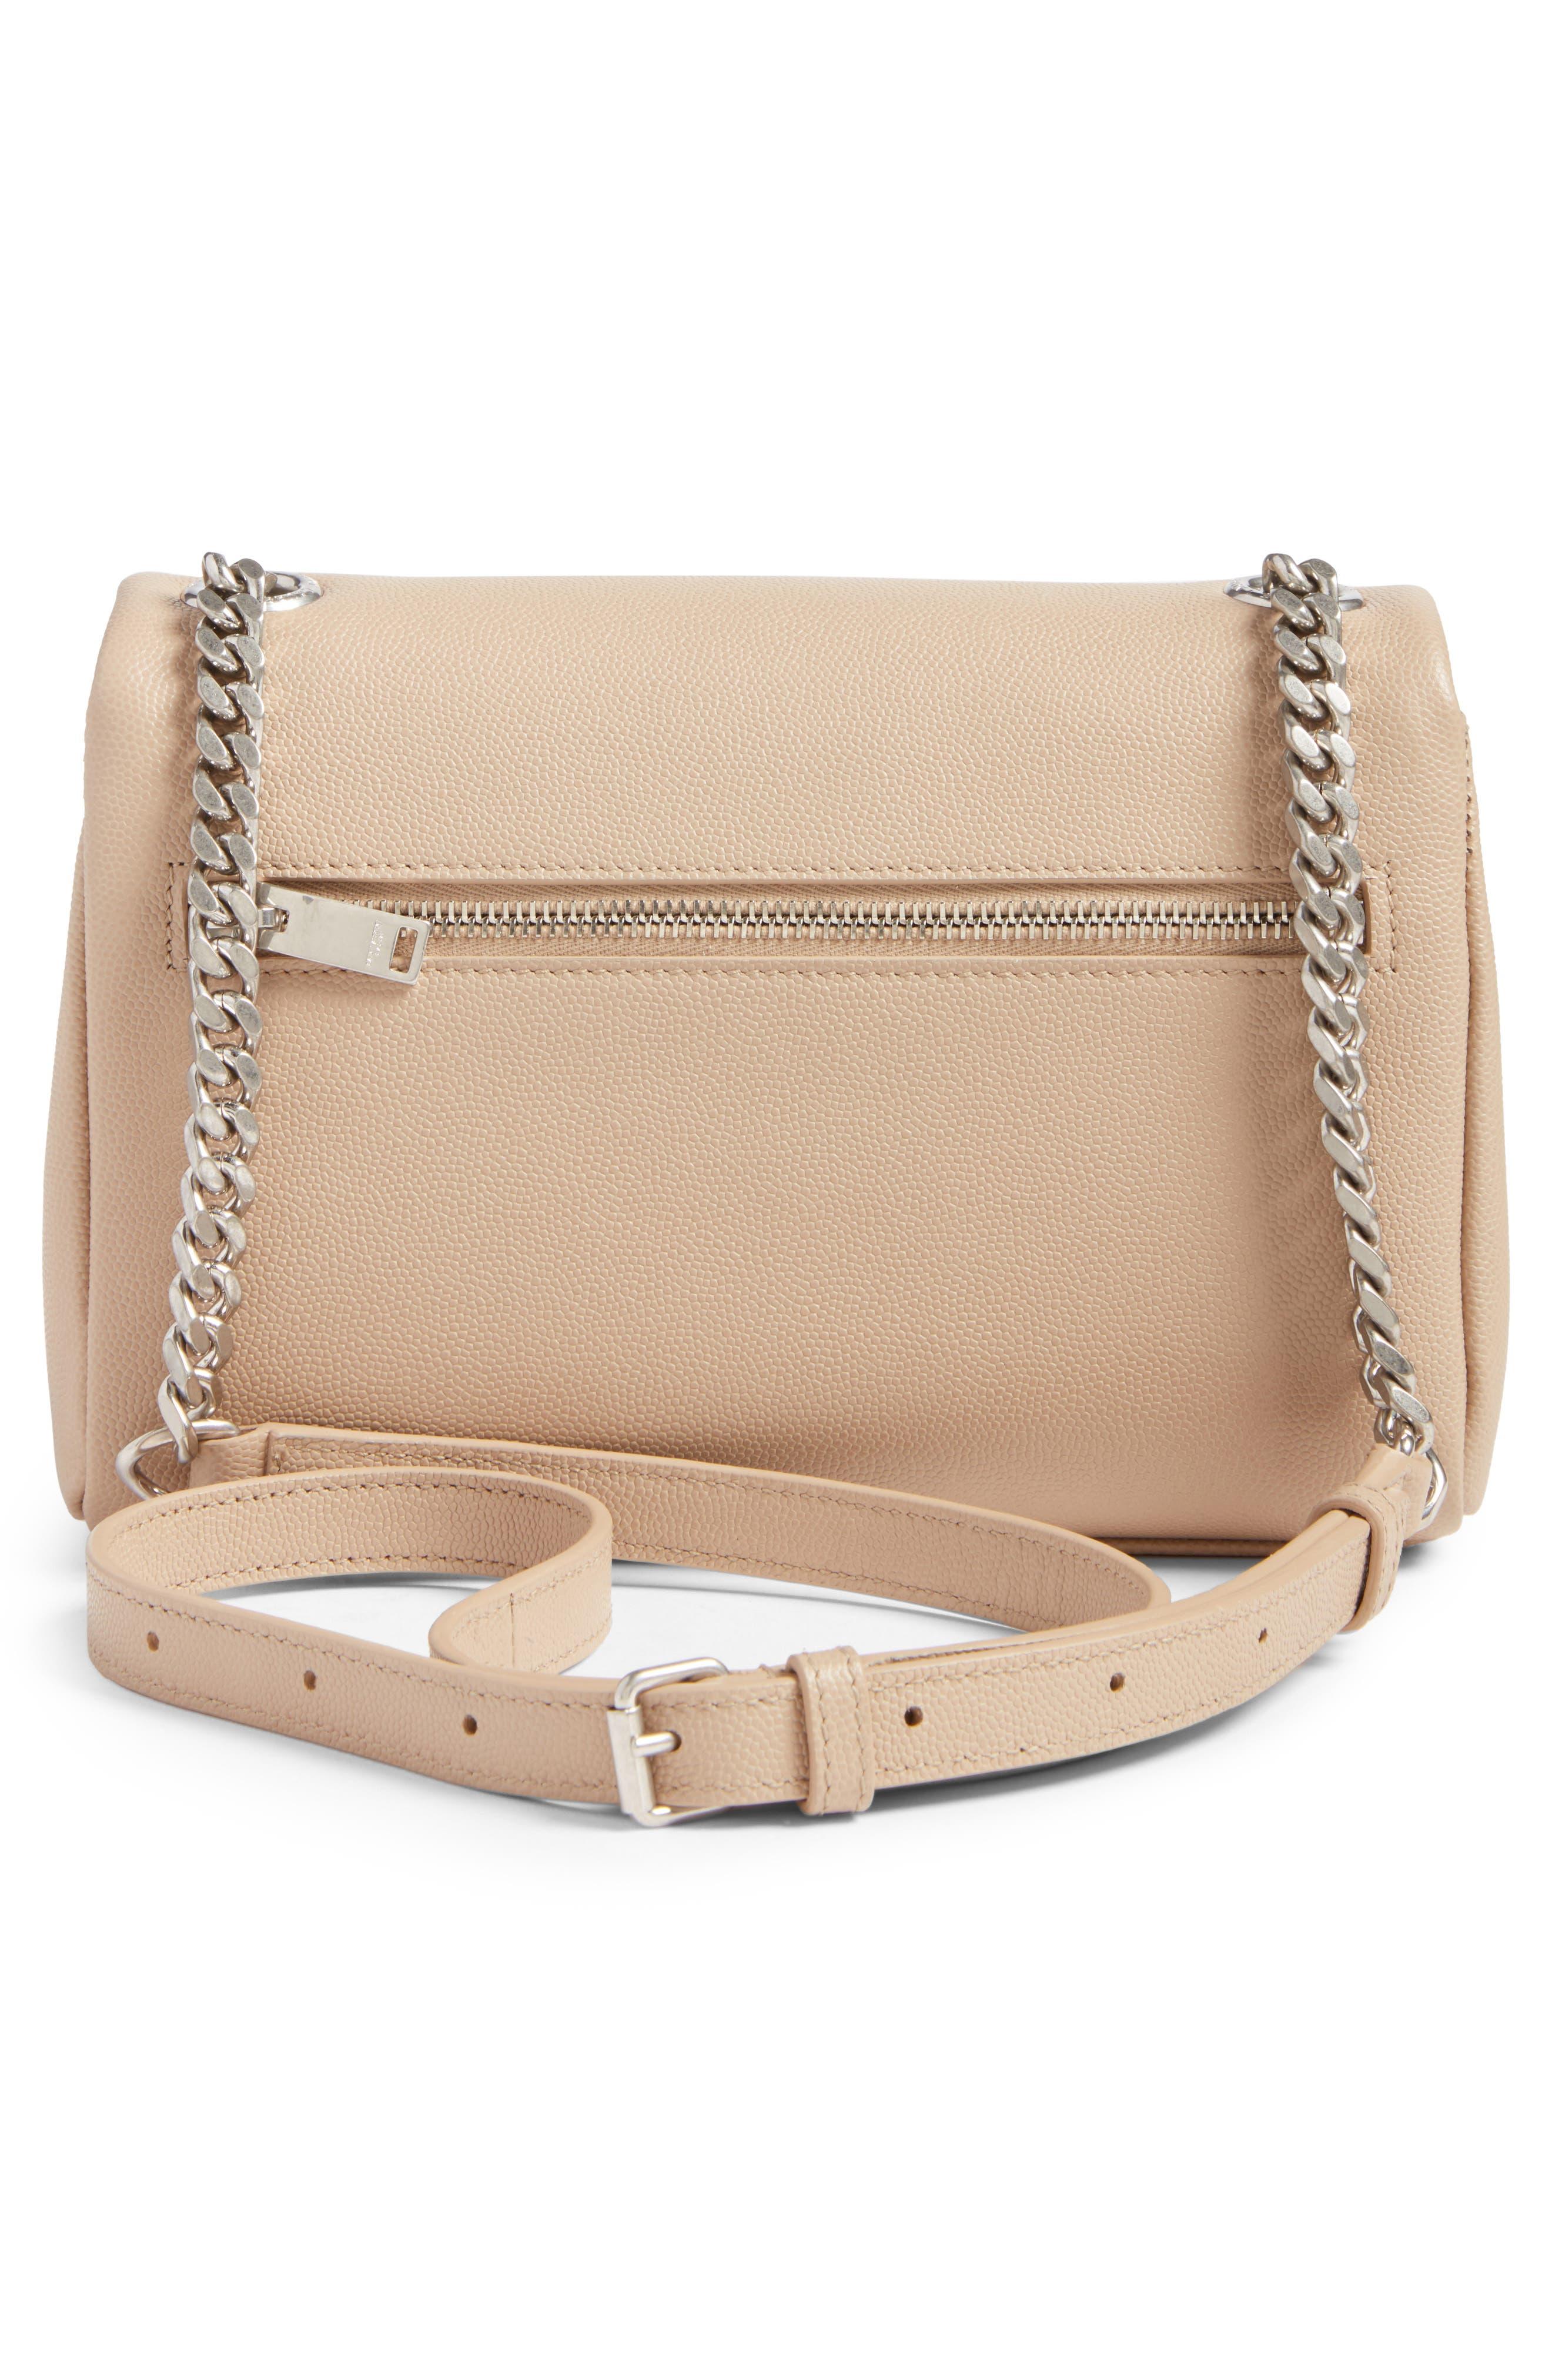 West Hollywood Calfskin Leather Messenger Bag,                             Alternate thumbnail 11, color,